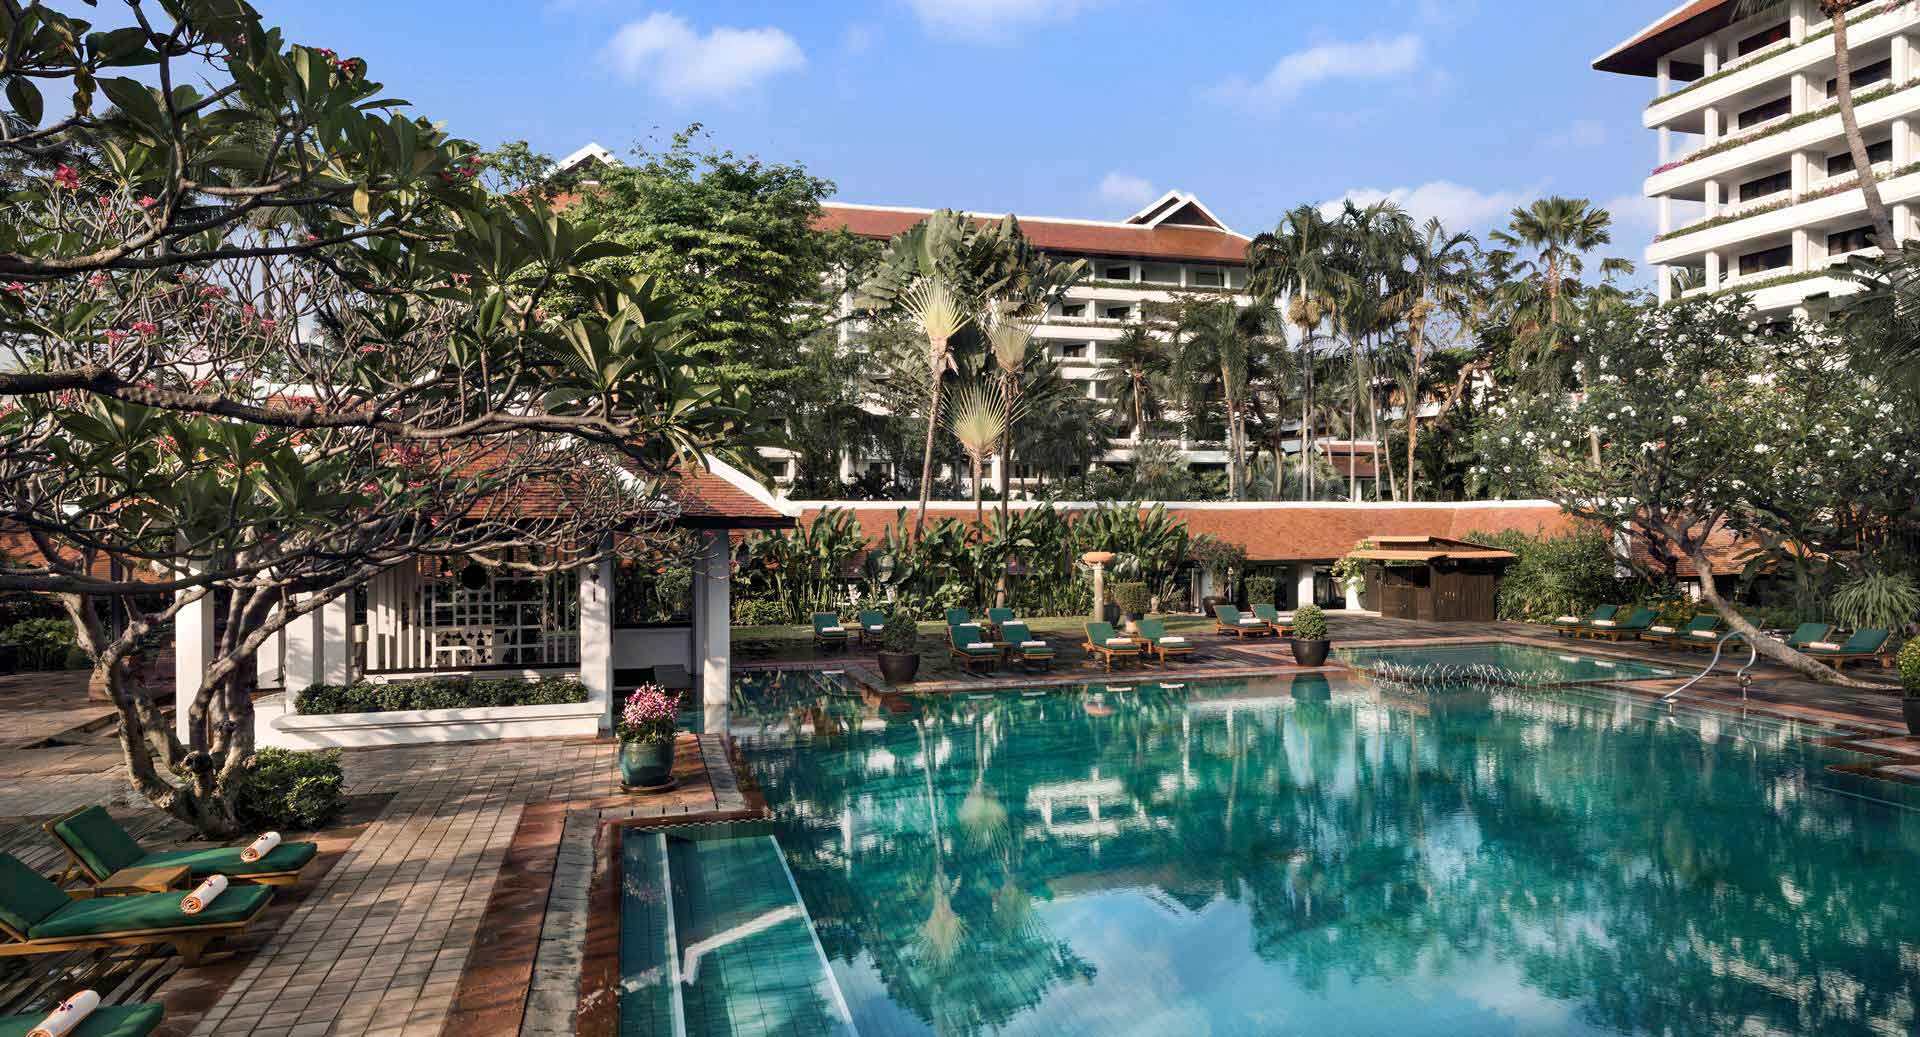 anantara_riverside_bangkok_pool_angle_1920x1037.jpg